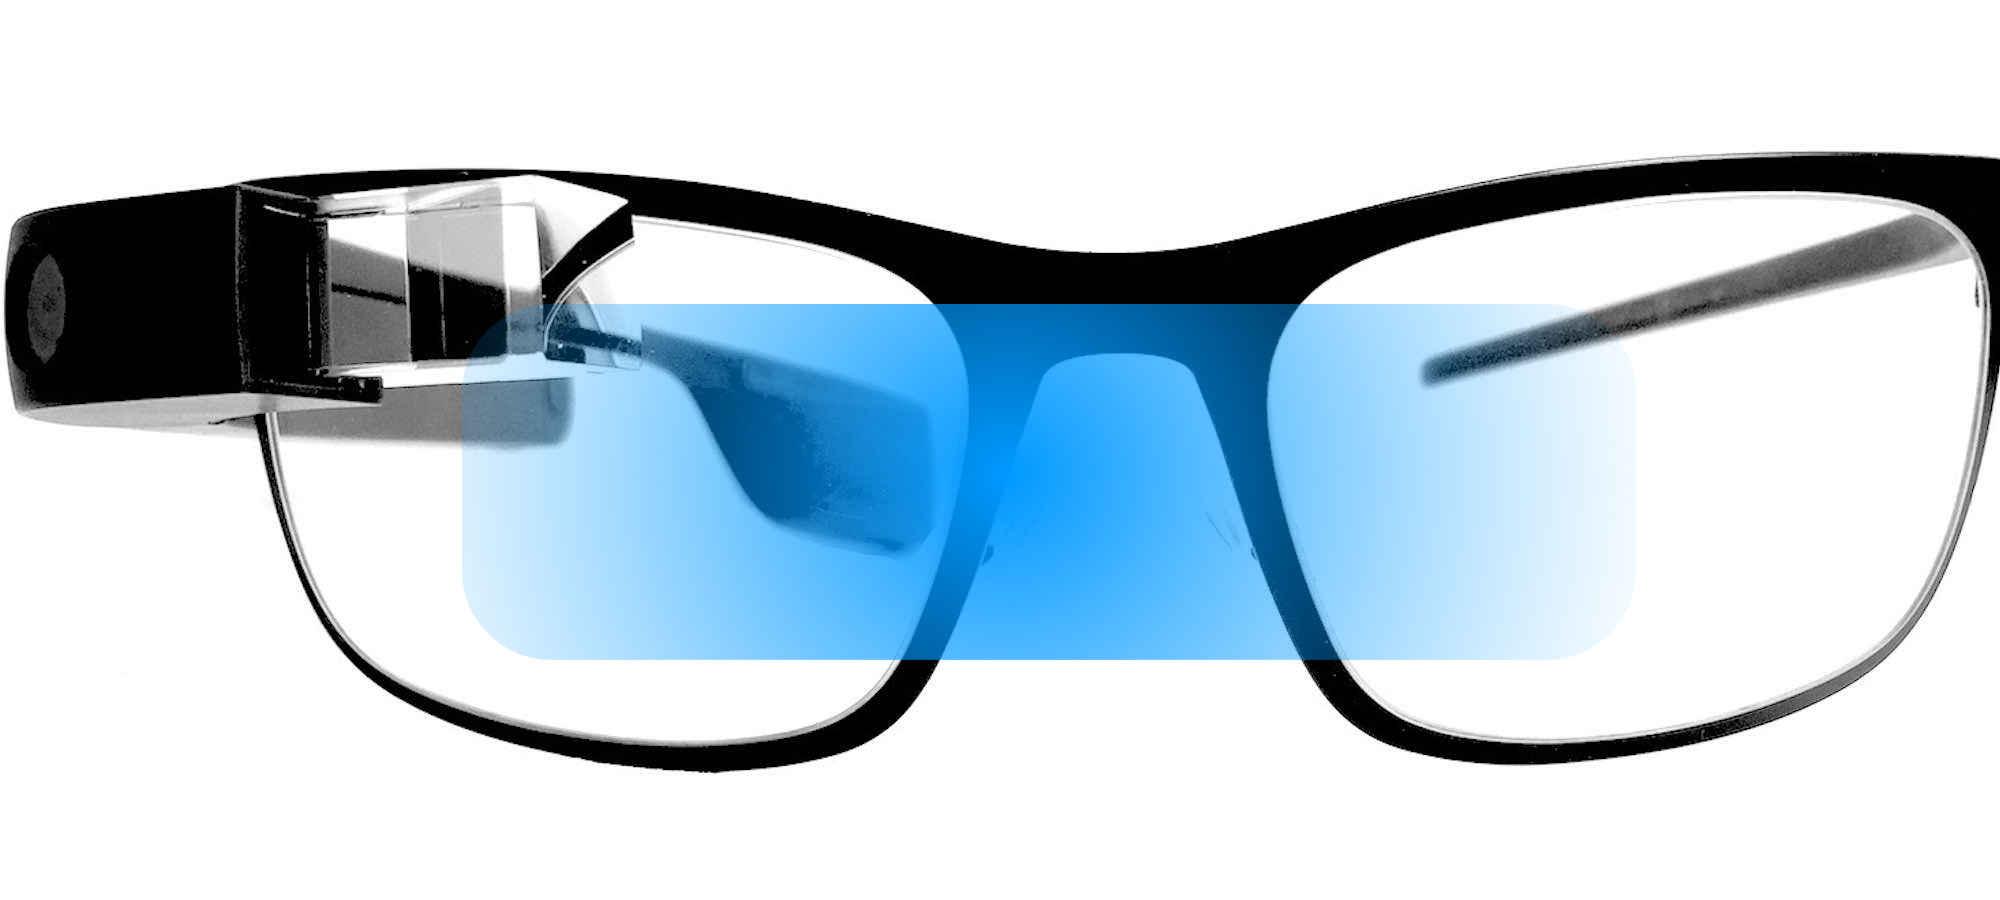 google-glass-2000-x-900